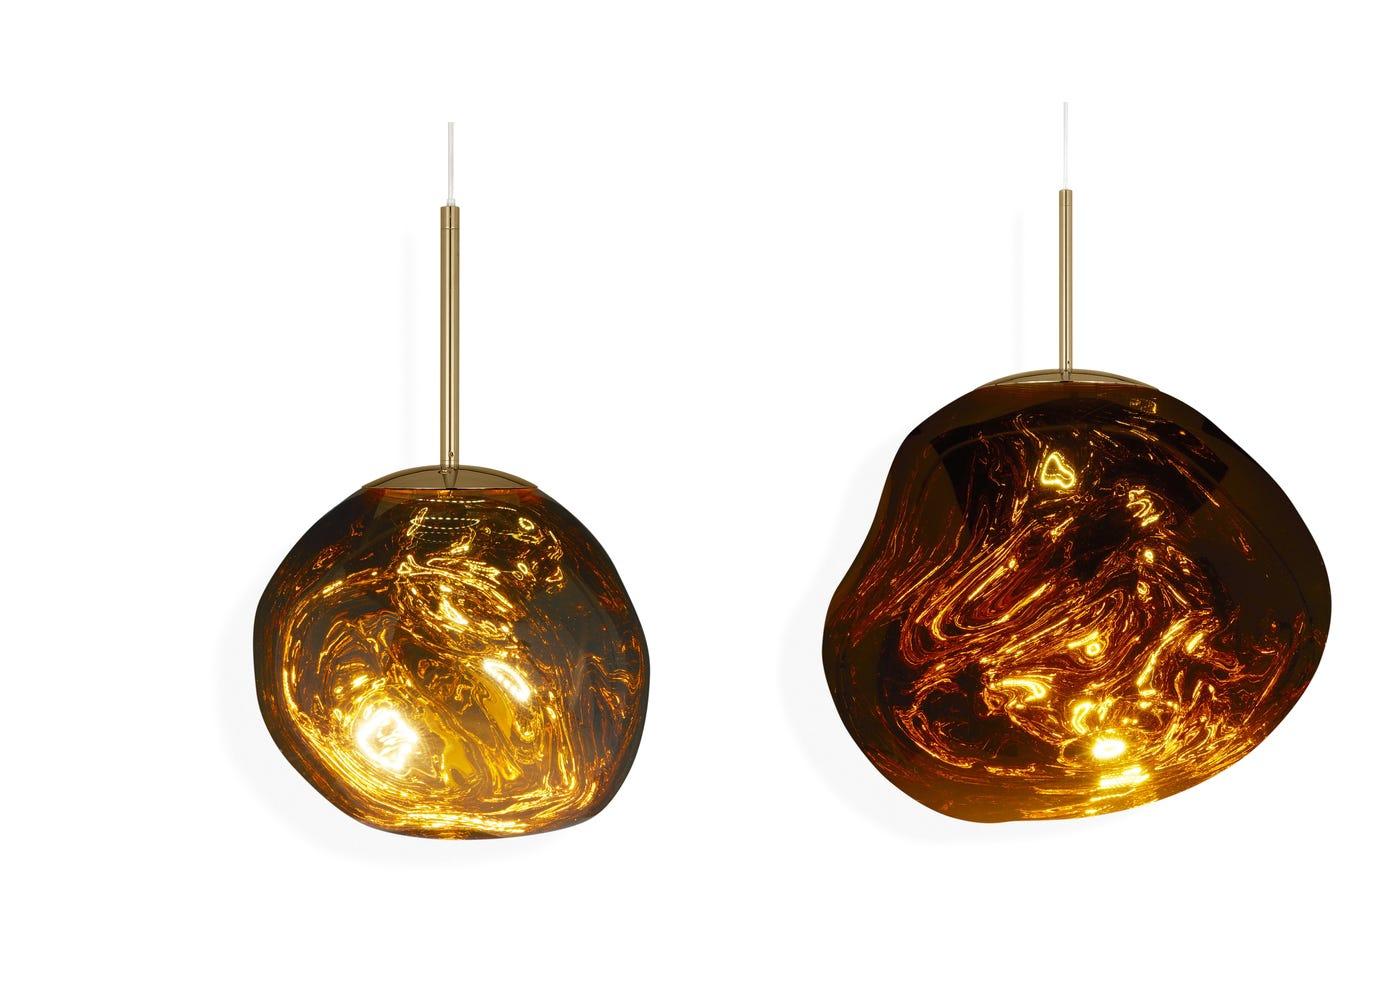 From left to right: Gold mini LED light on, Gold standard LED light on